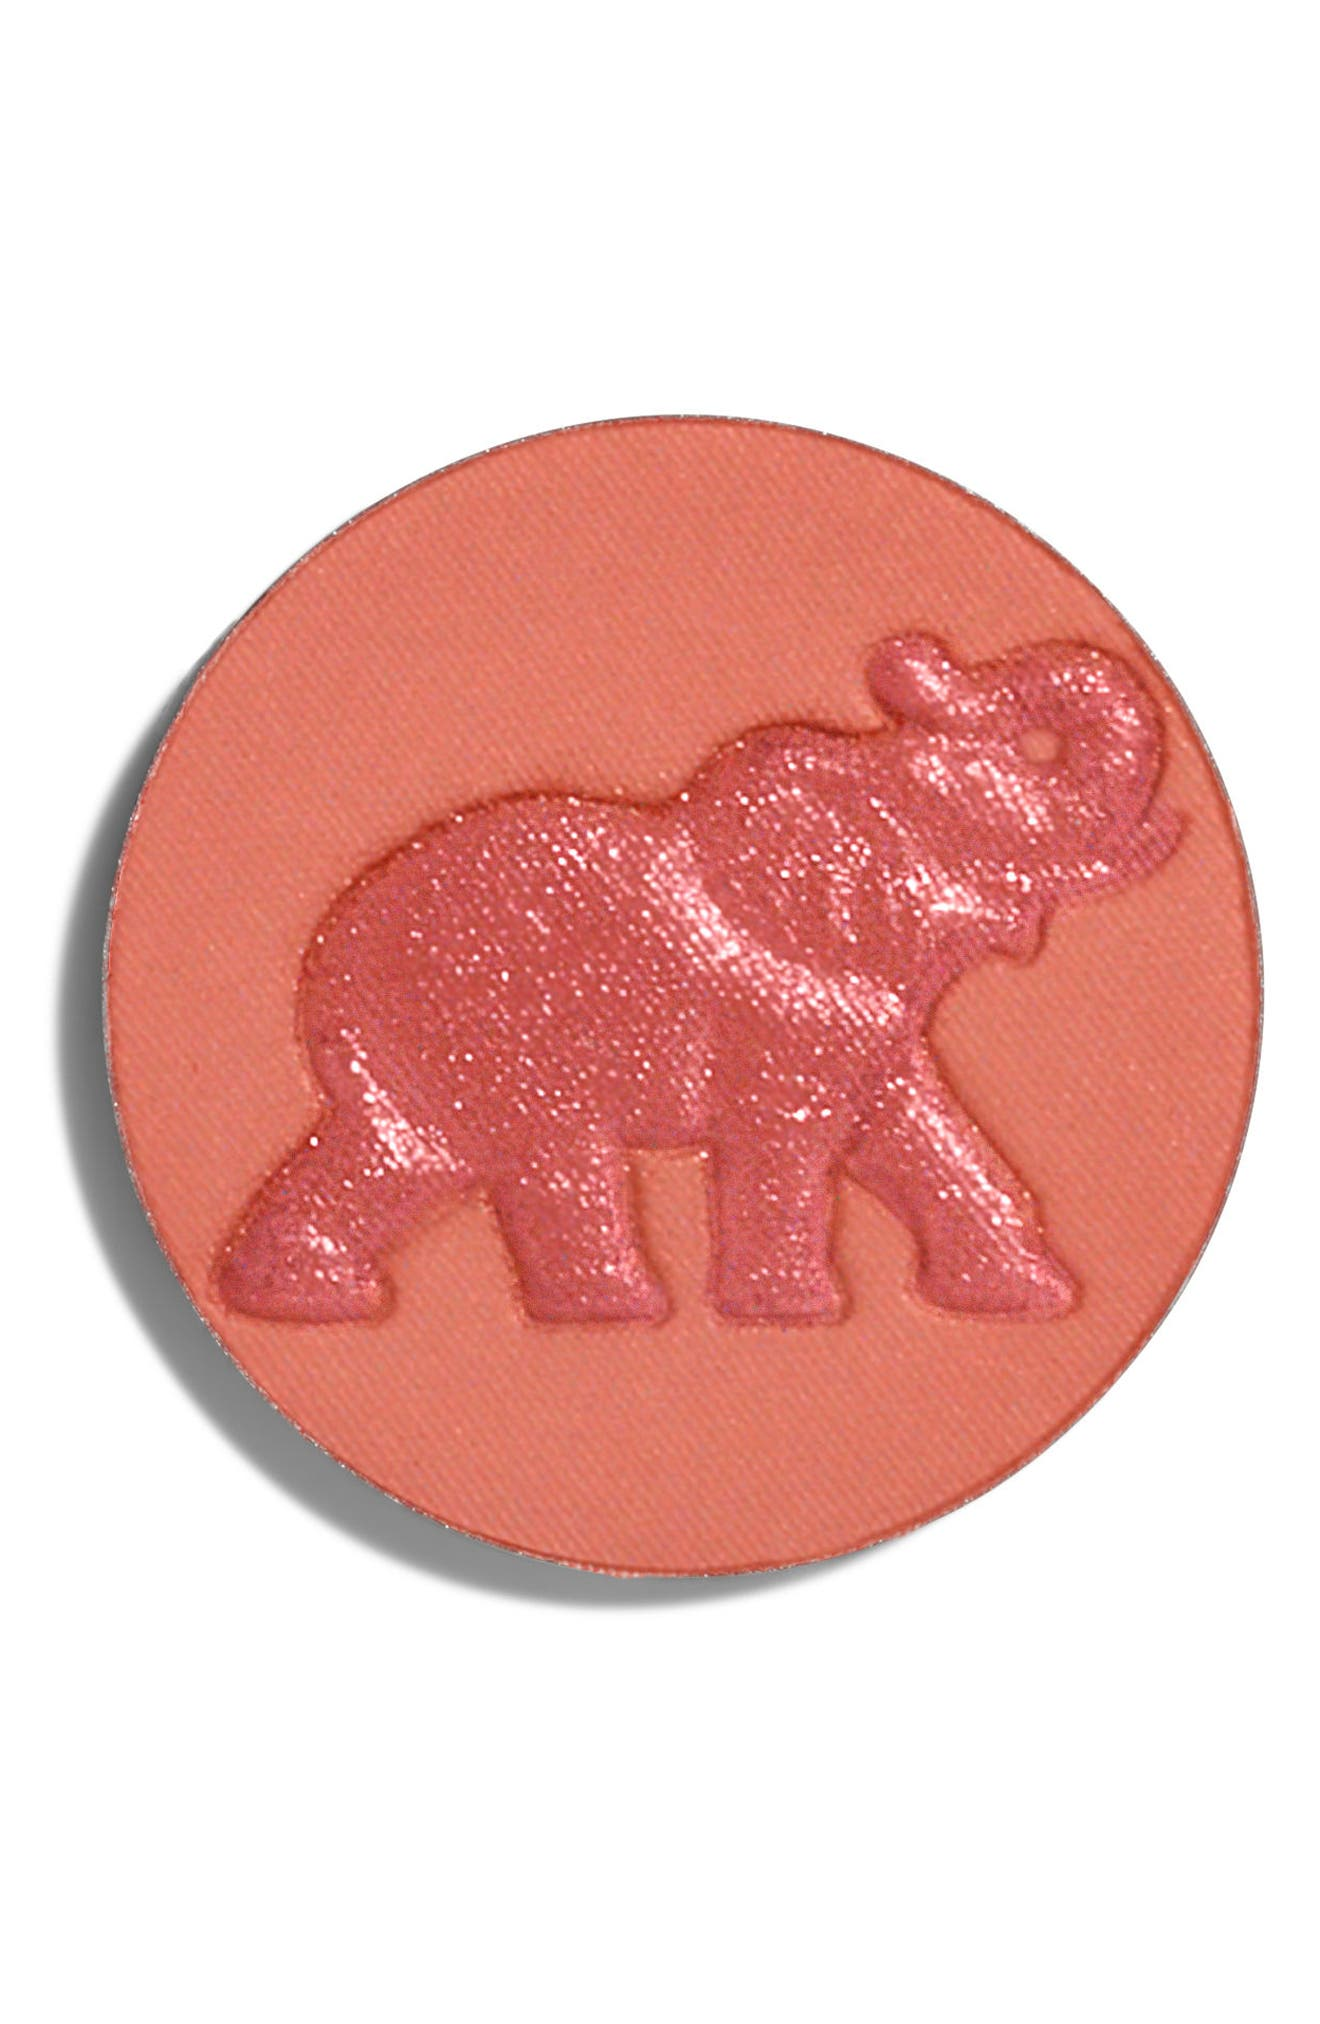 Philanthropy Cheek Shade Refill,                         Main,                         color, SMITTEN - ELEPHANT